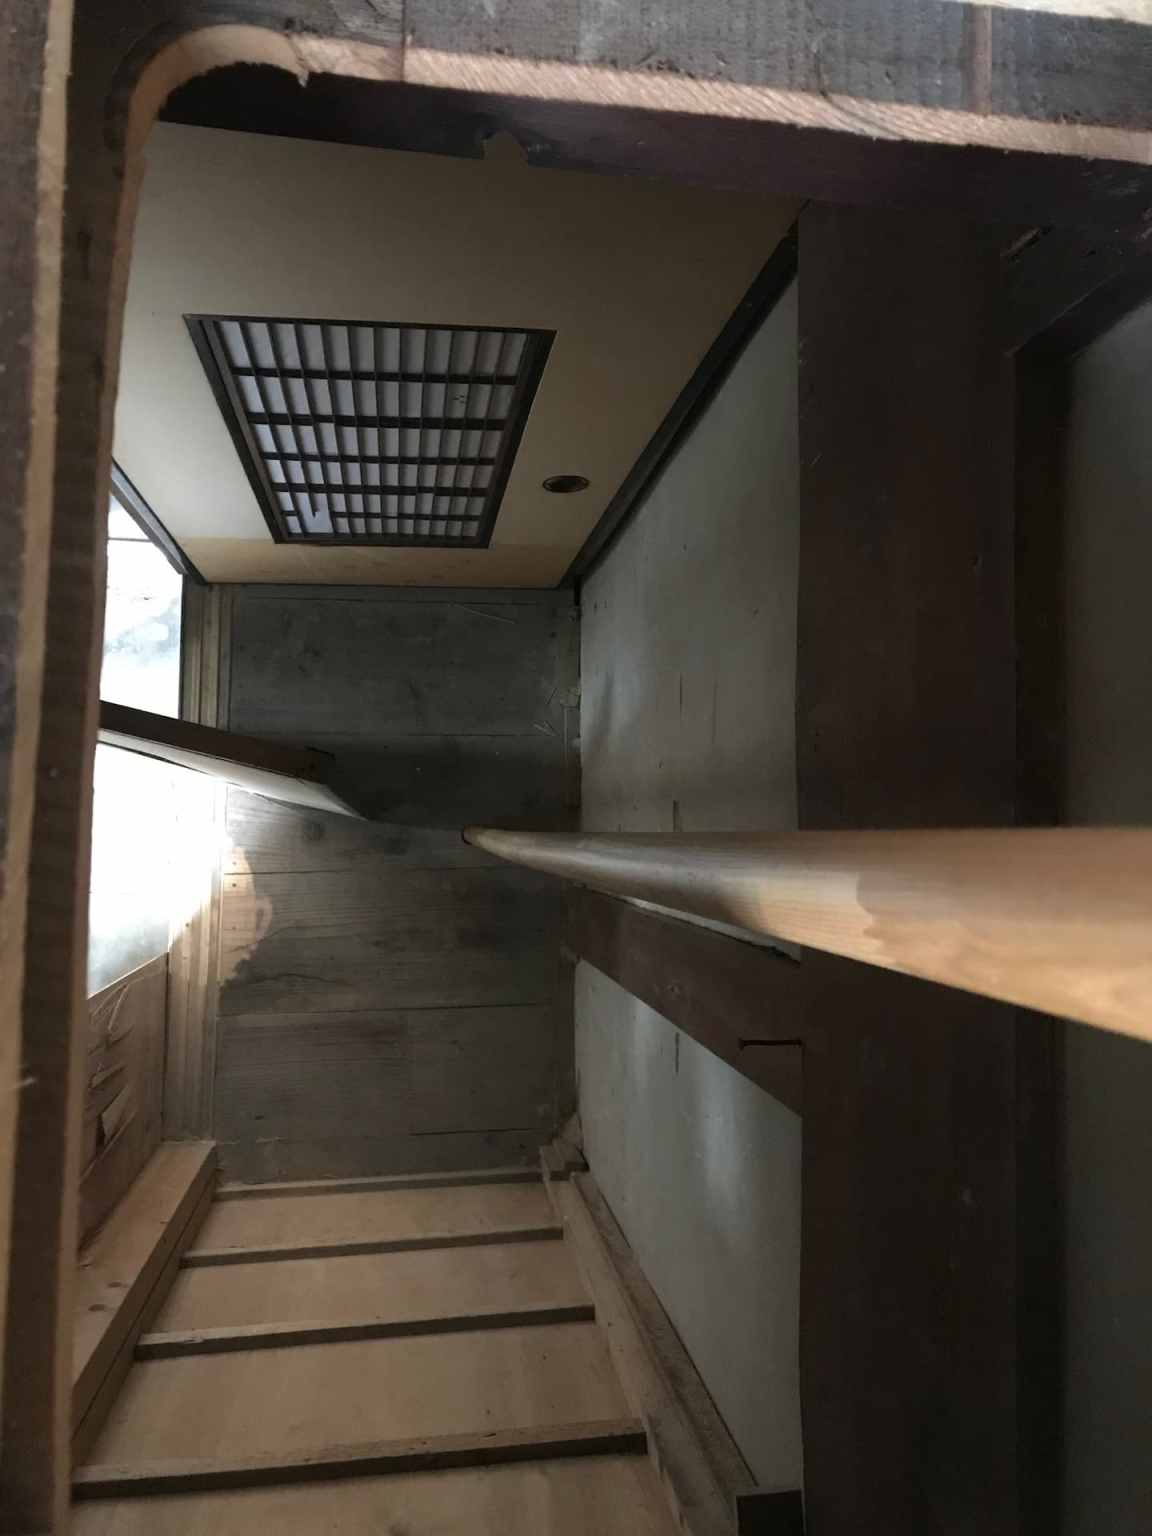 Iga-no-Kura-Ninja-Residence-Airbnb-accommodation-hotel-stay-Japan-travel-Mie-Japanese-minshuku-16.jpg